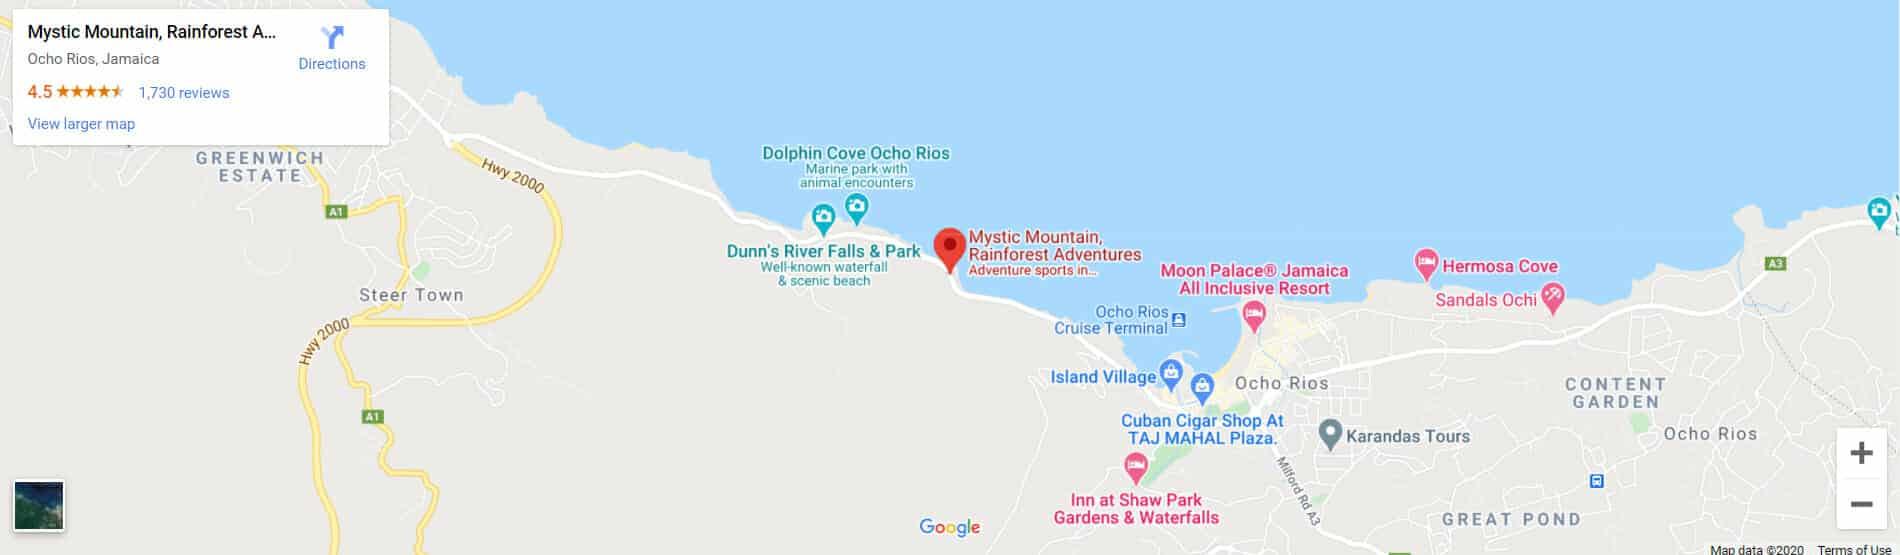 Mystic Mountain Jamaica Google Maps location screenshot